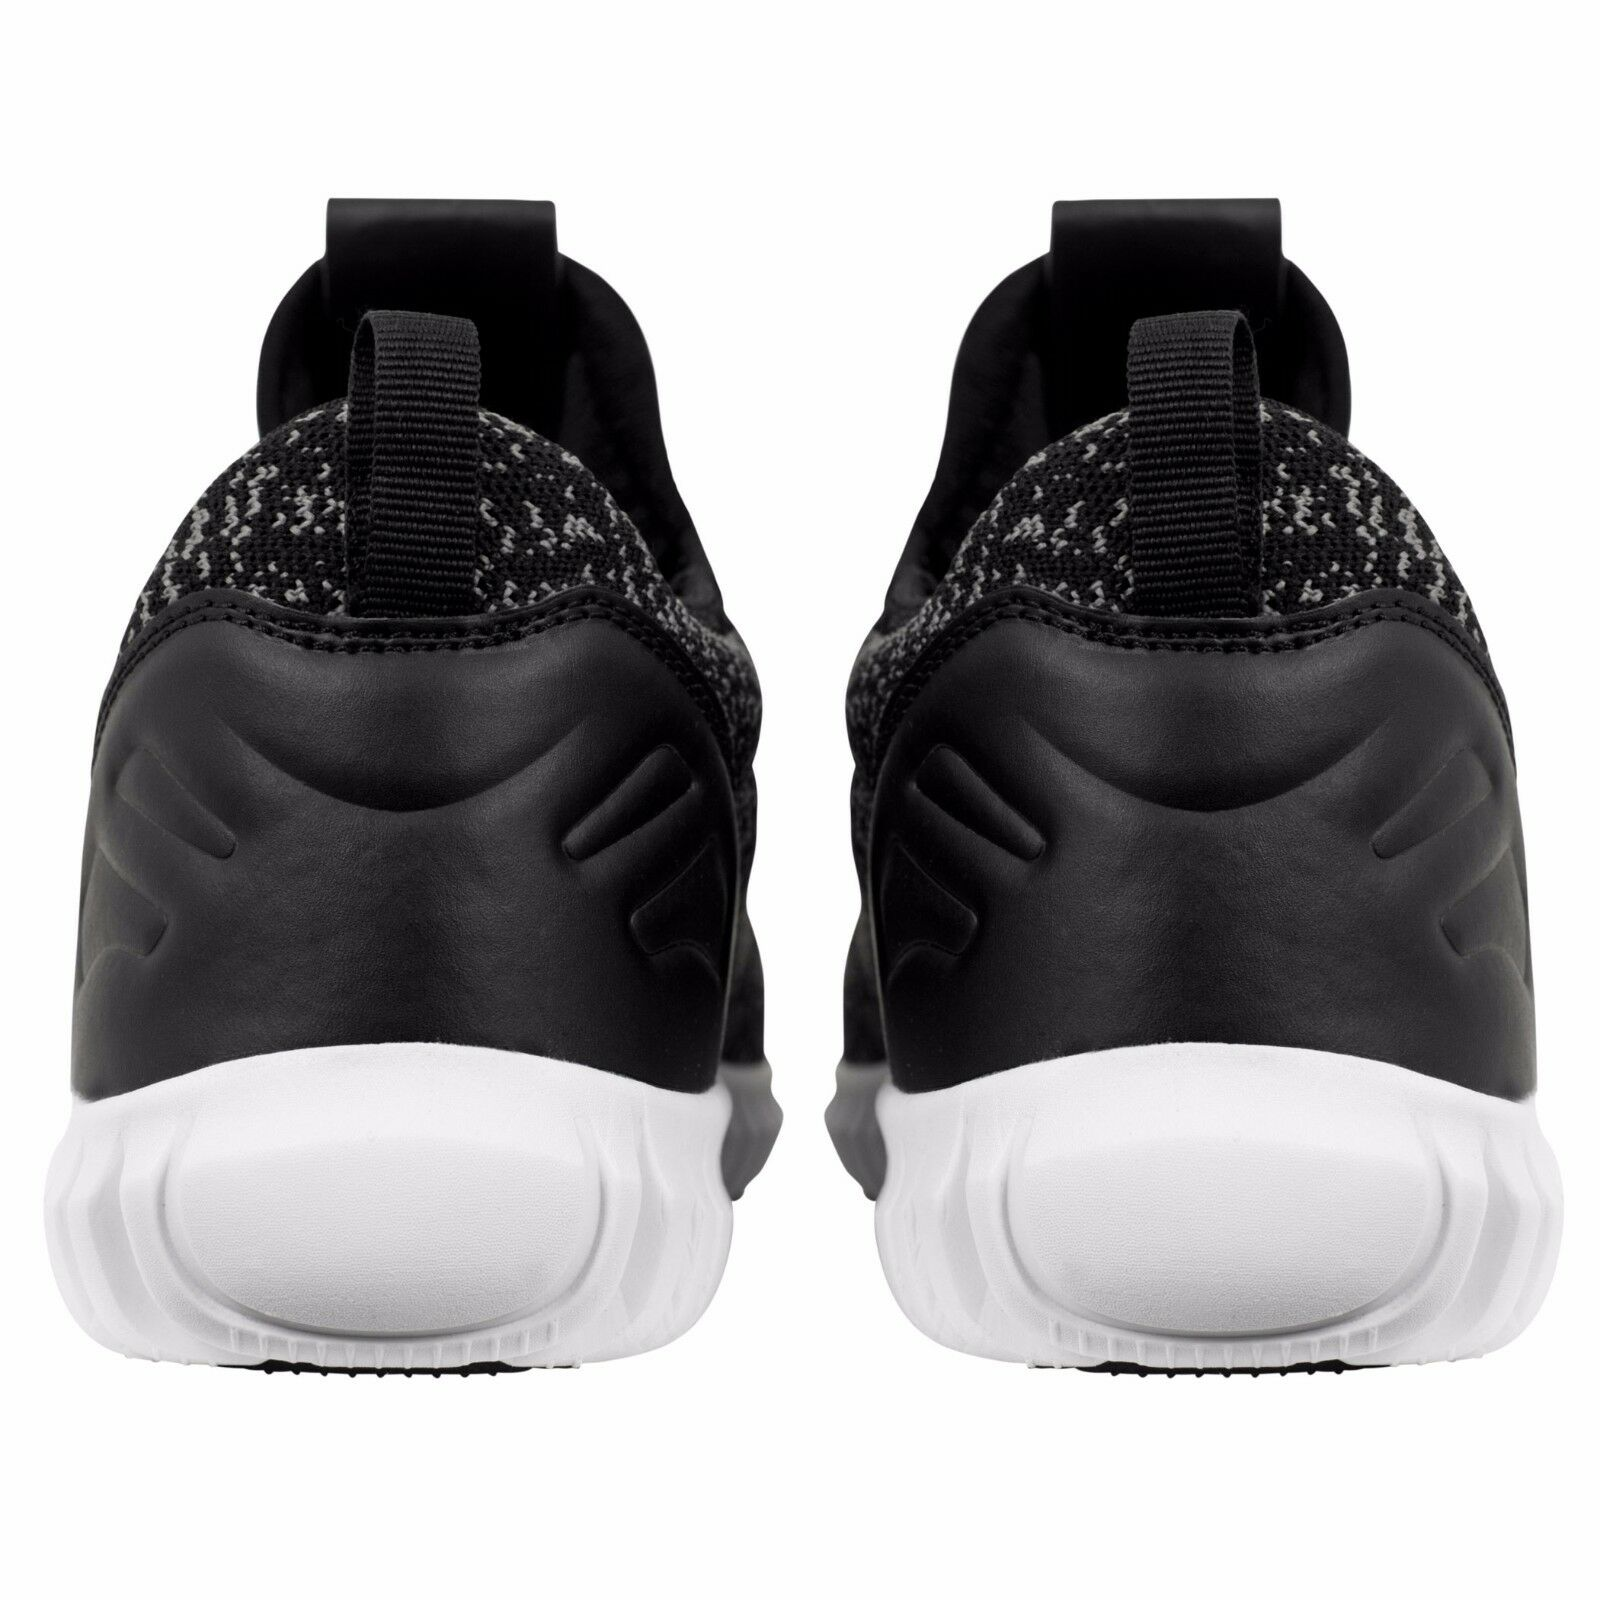 Urban Classics Damen Knitted Light Schuhe Unisex Herren Damen Classics Sneaker 36-47 TB1480 6bddff